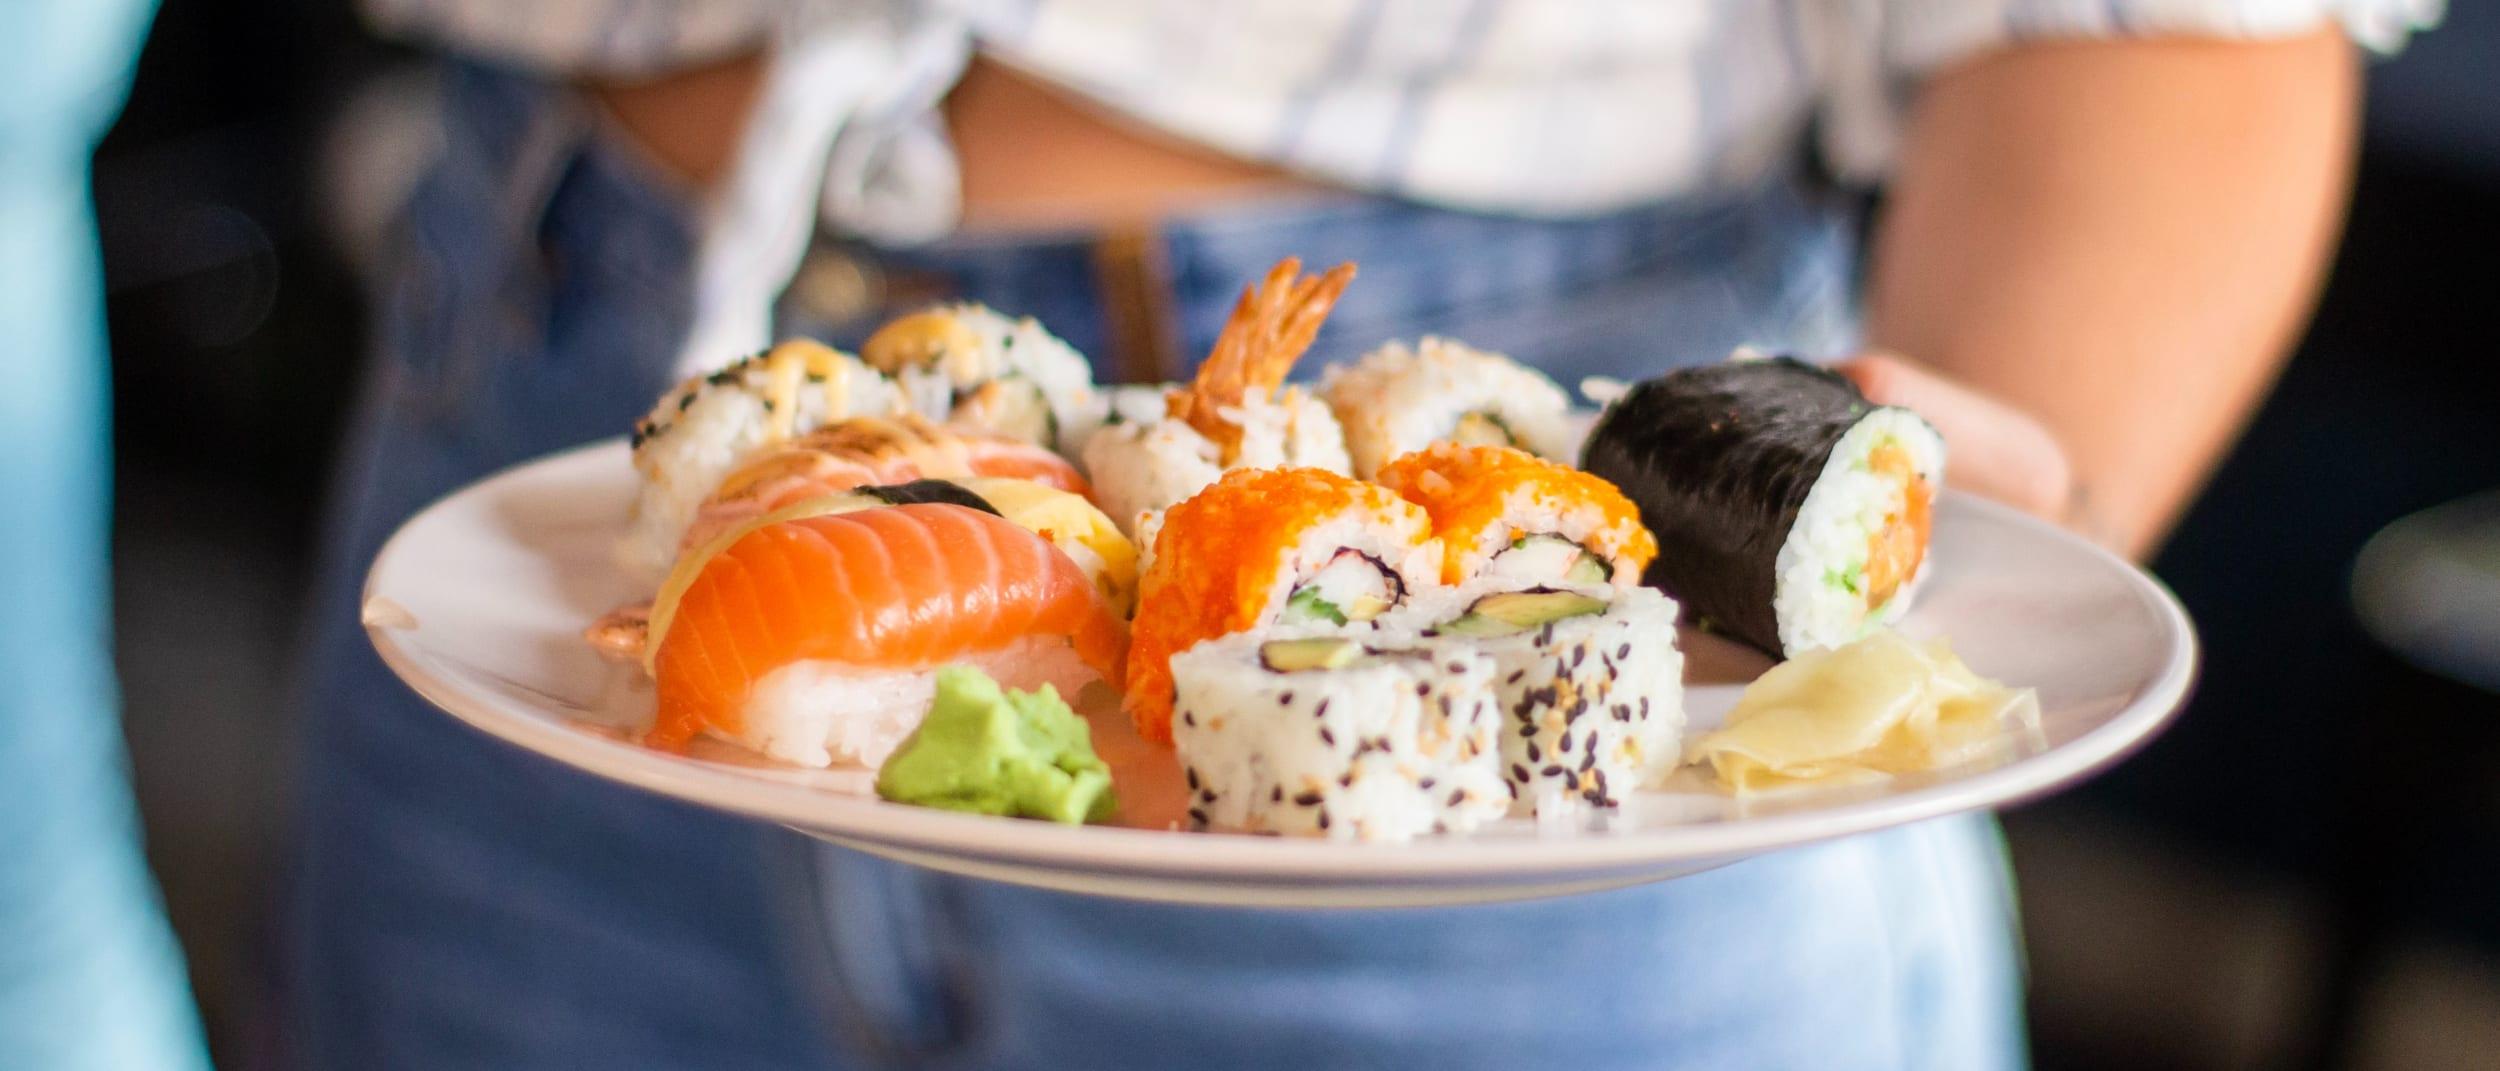 Know your bonito from your unagi: Sushi and sashimi explained